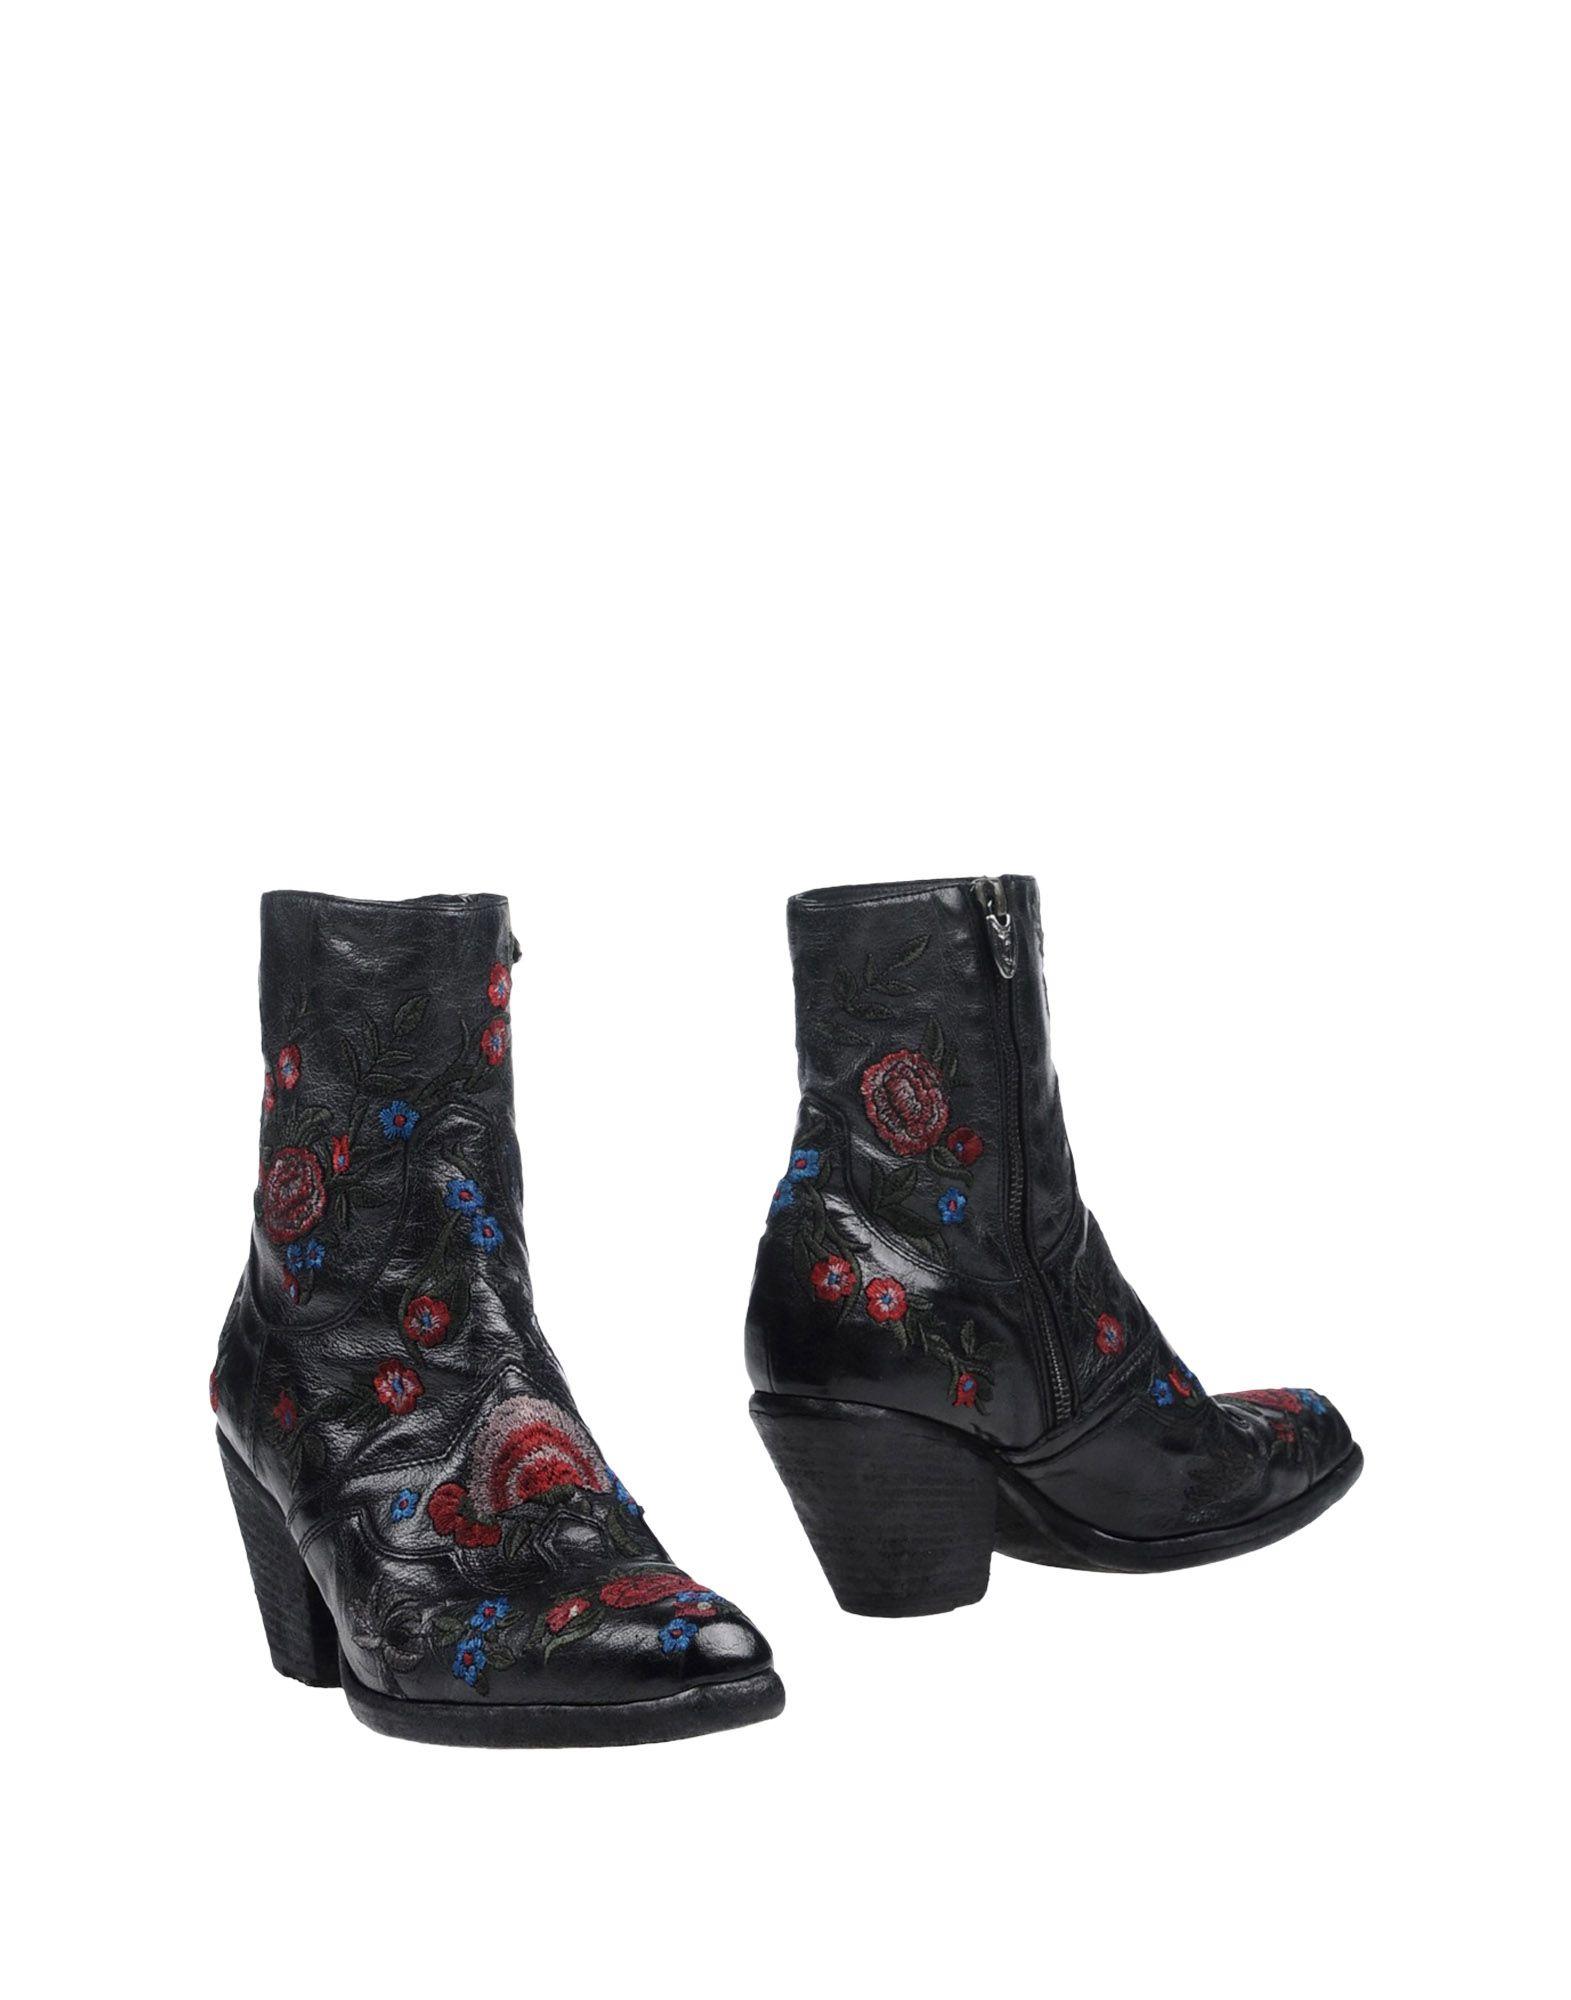 Fauzian 11448598KO Jeunesse Vintage Stiefelette Damen  11448598KO Fauzian Neue Schuhe f5b1c1